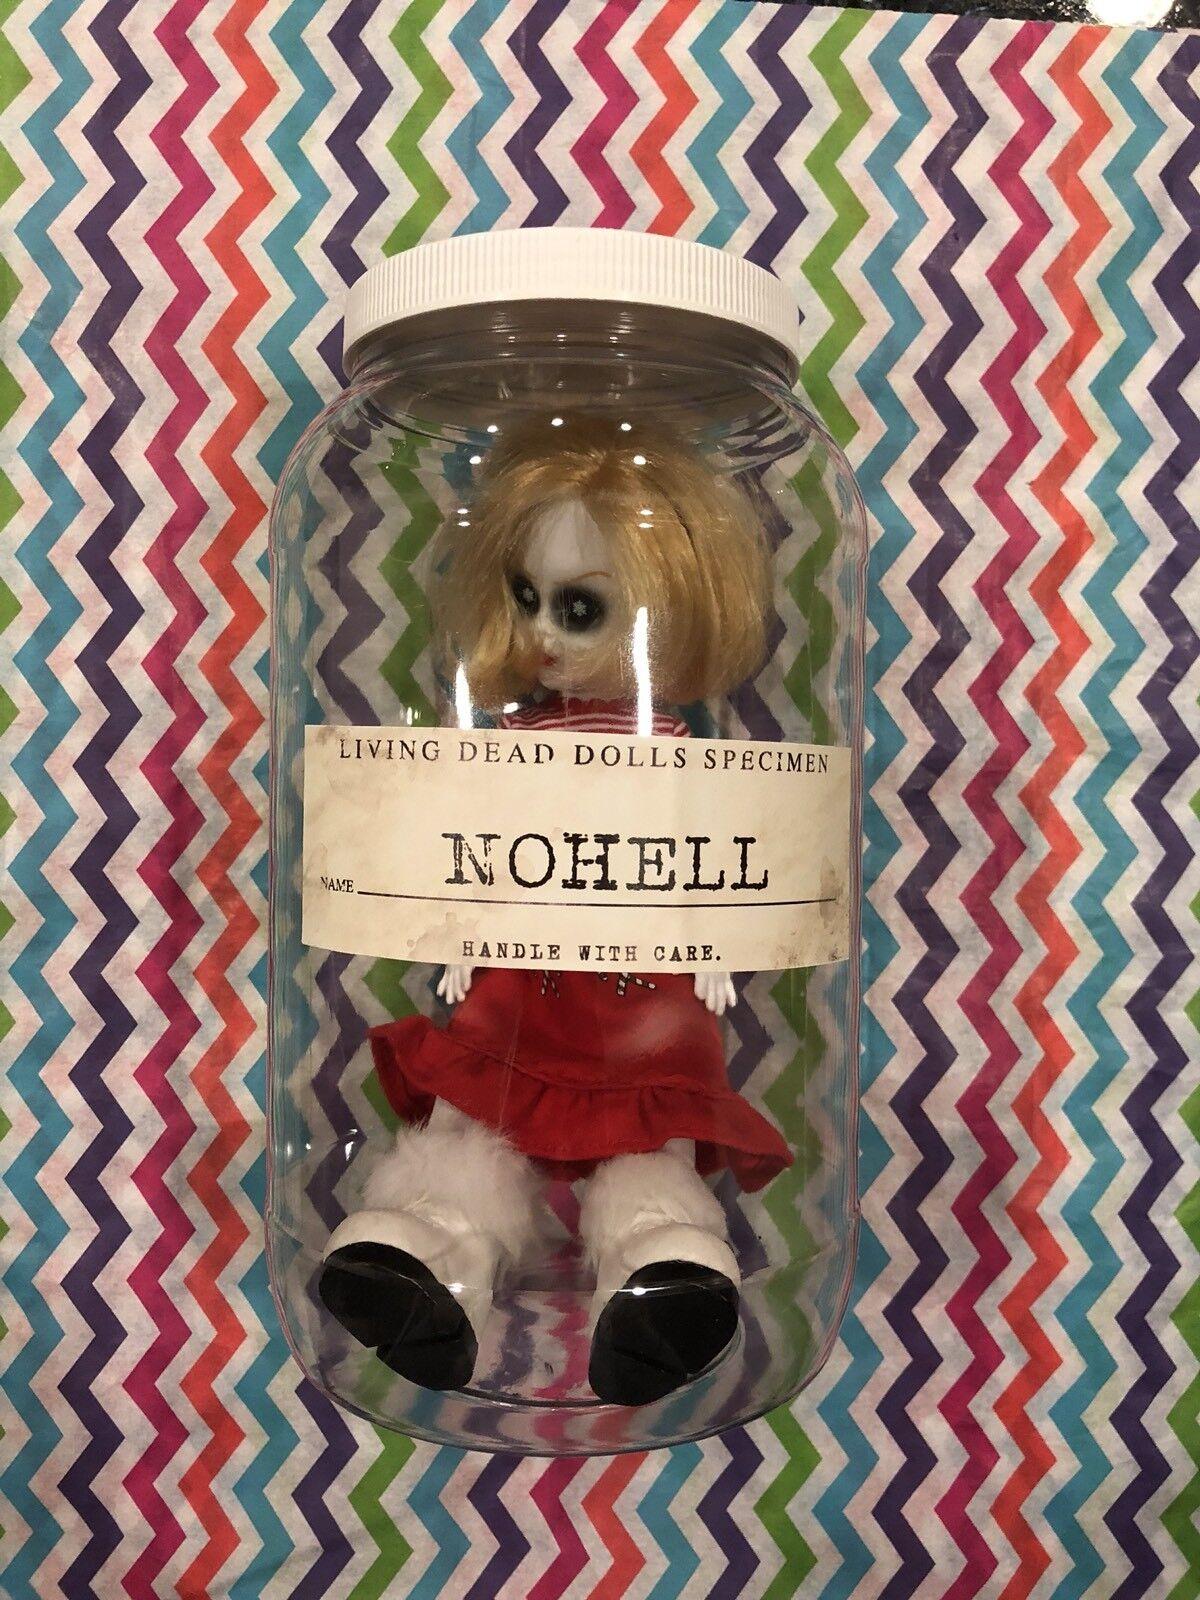 Mezco Living Dead Dolls espécimen Tarro nohell Ángel de Navidad de un tipo de envío gratis